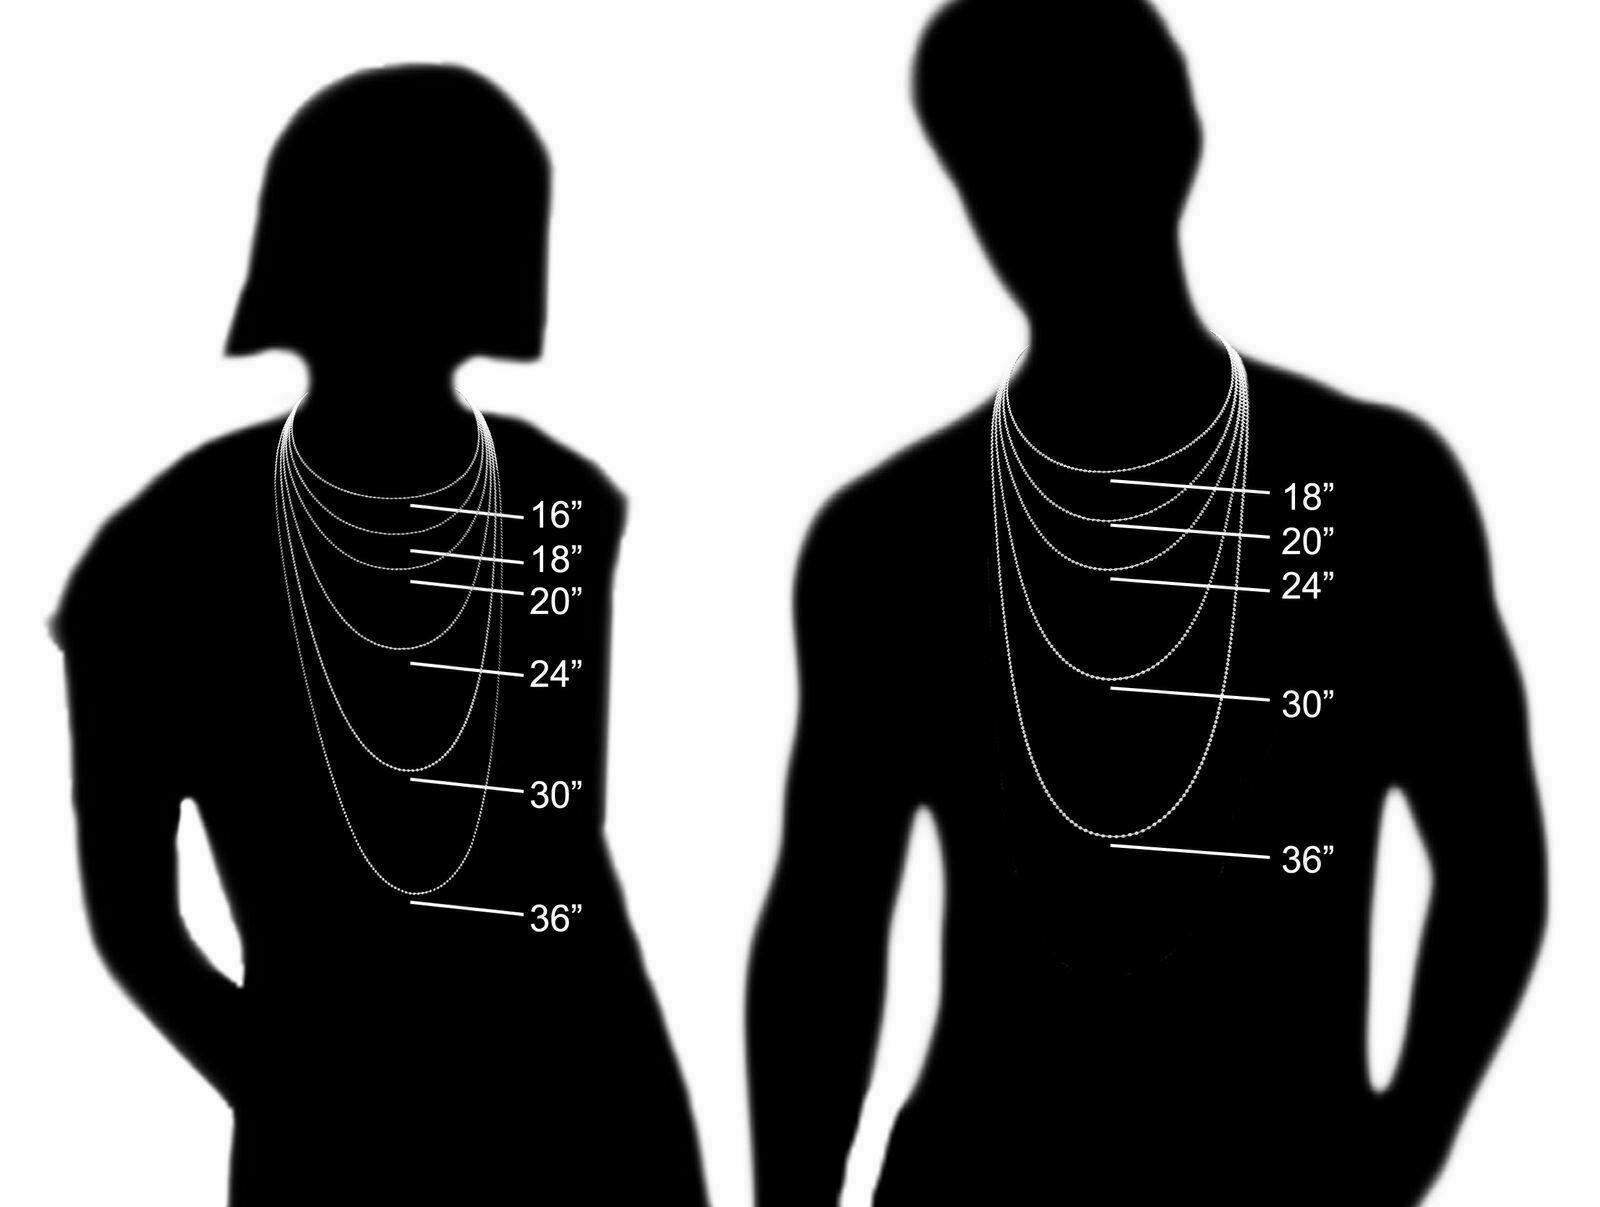 "10K Yellow Gold 1.5mm Diamond Cut Rope Chain Pendant Necklace Mens Women 16""-26"" 9"